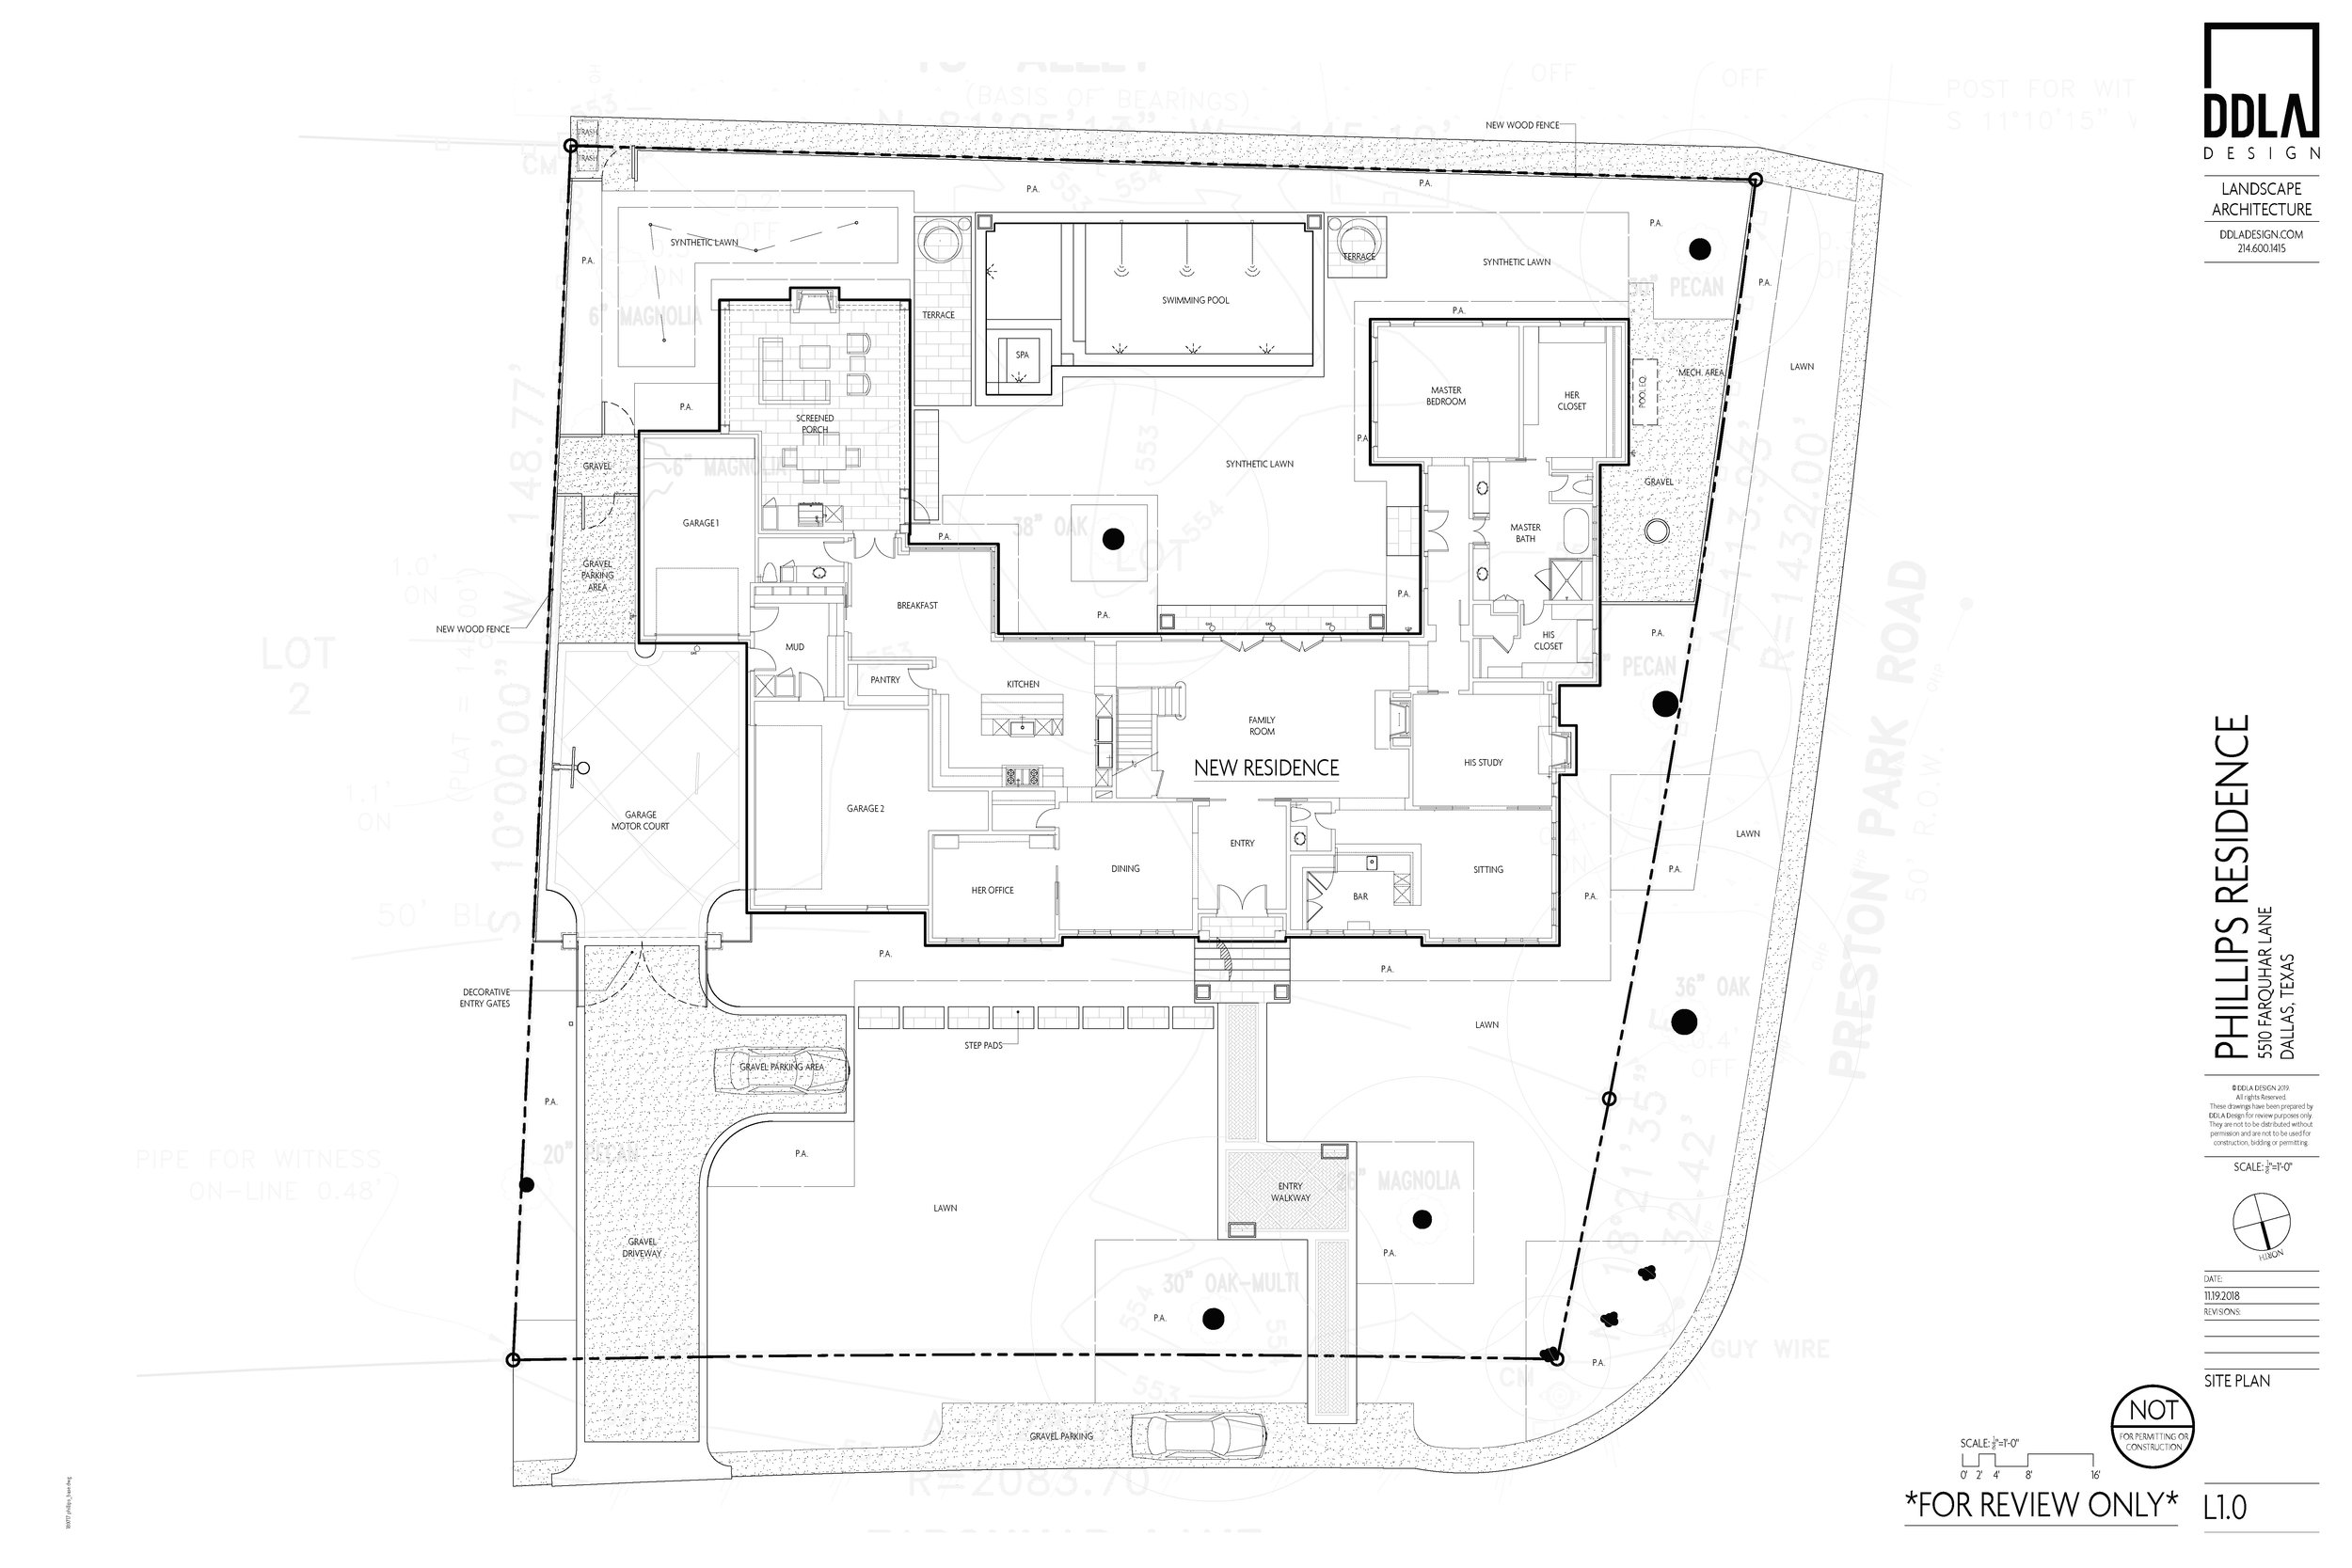 190125 phillips_L1.0 site plan.jpg